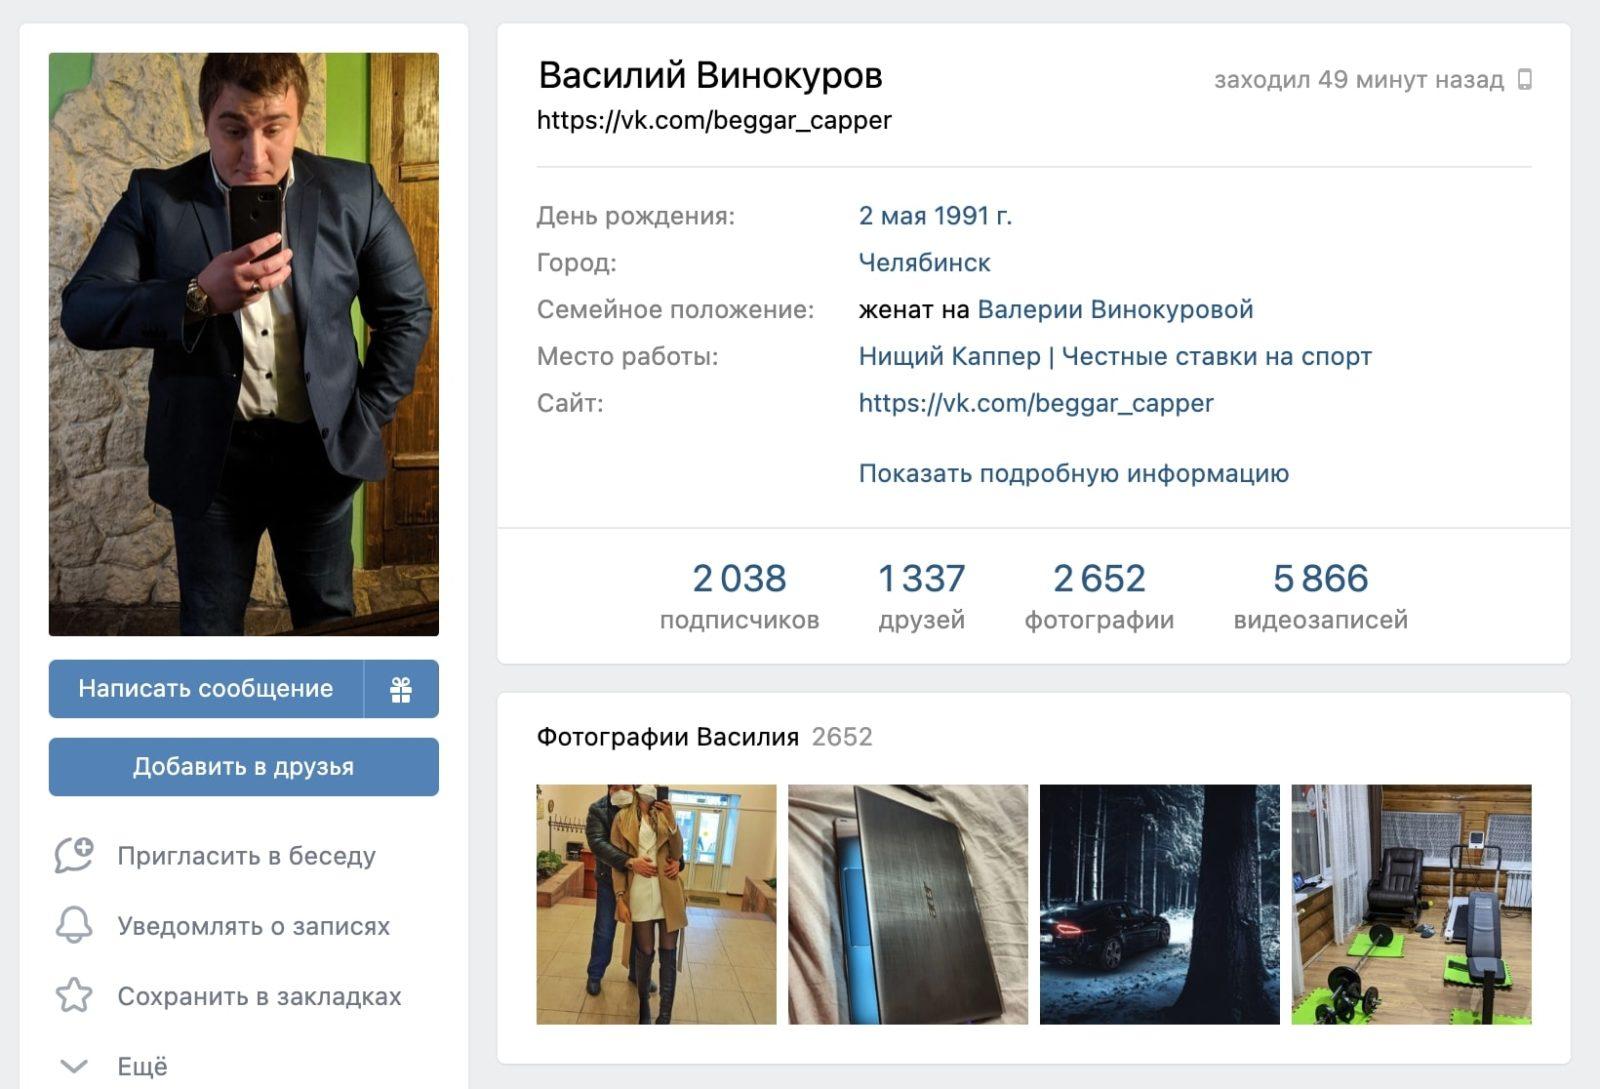 Личная страница каппера Василия Винокурова